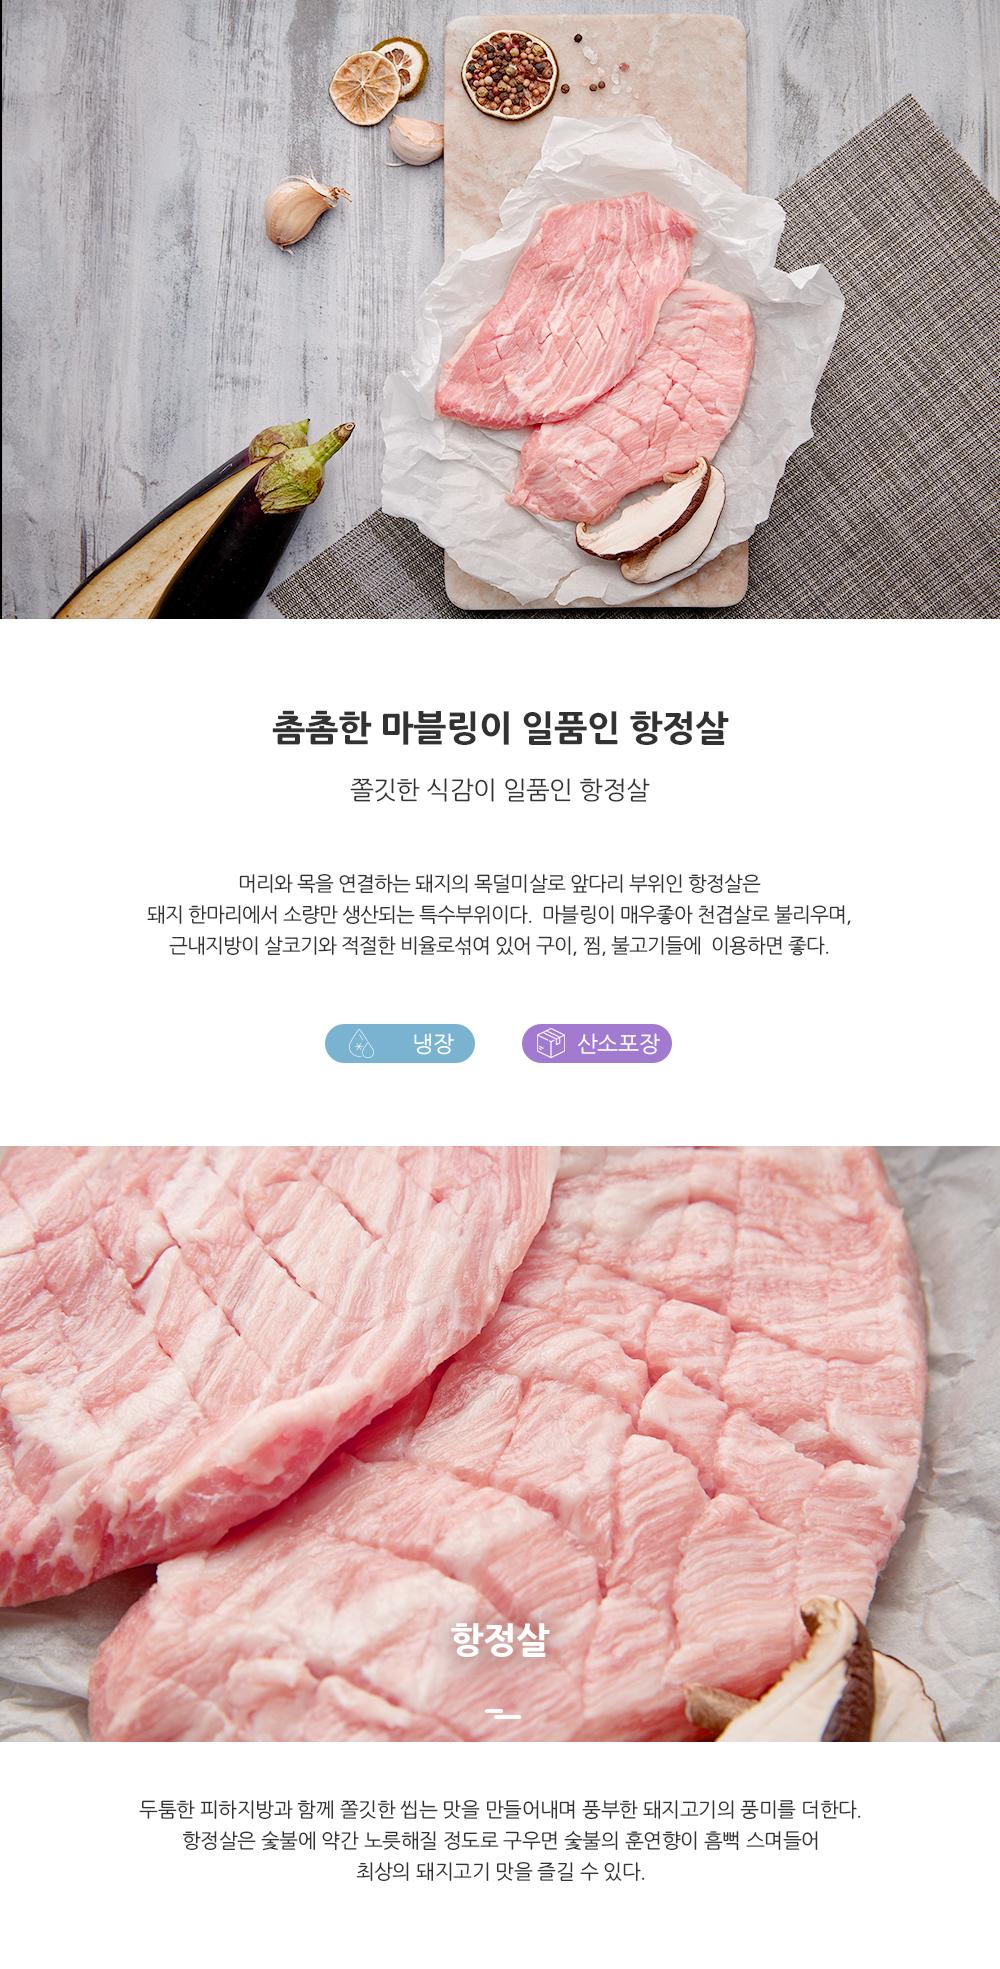 hangjeongsal_01.jpg